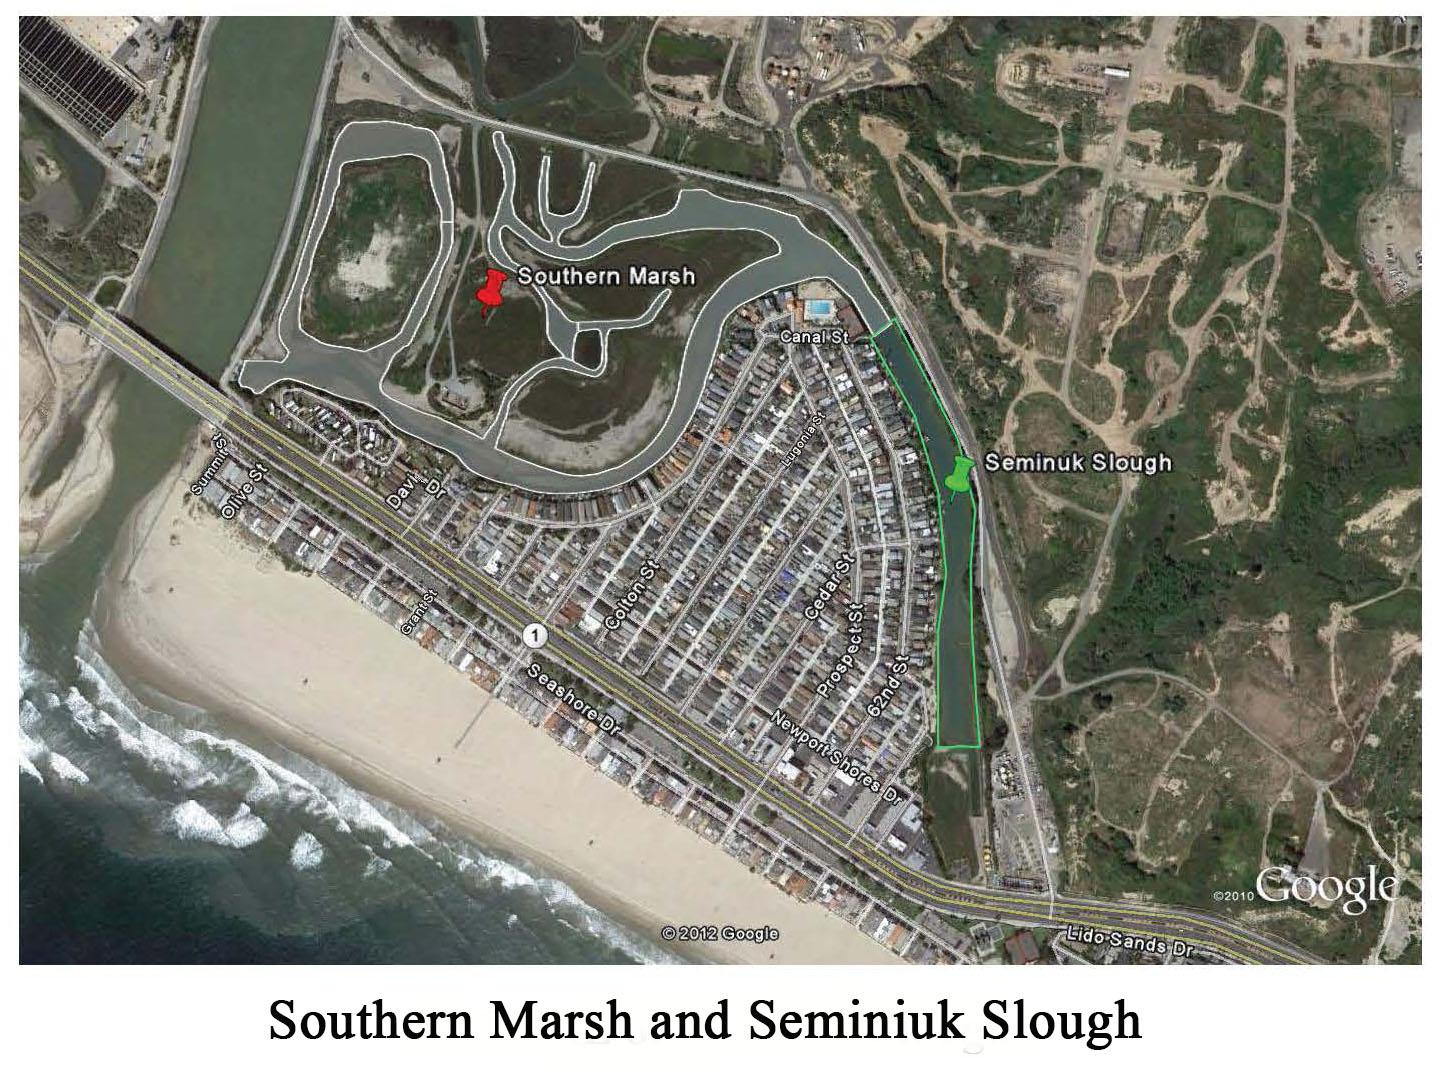 Southern Marsh & Seminiuk Slough